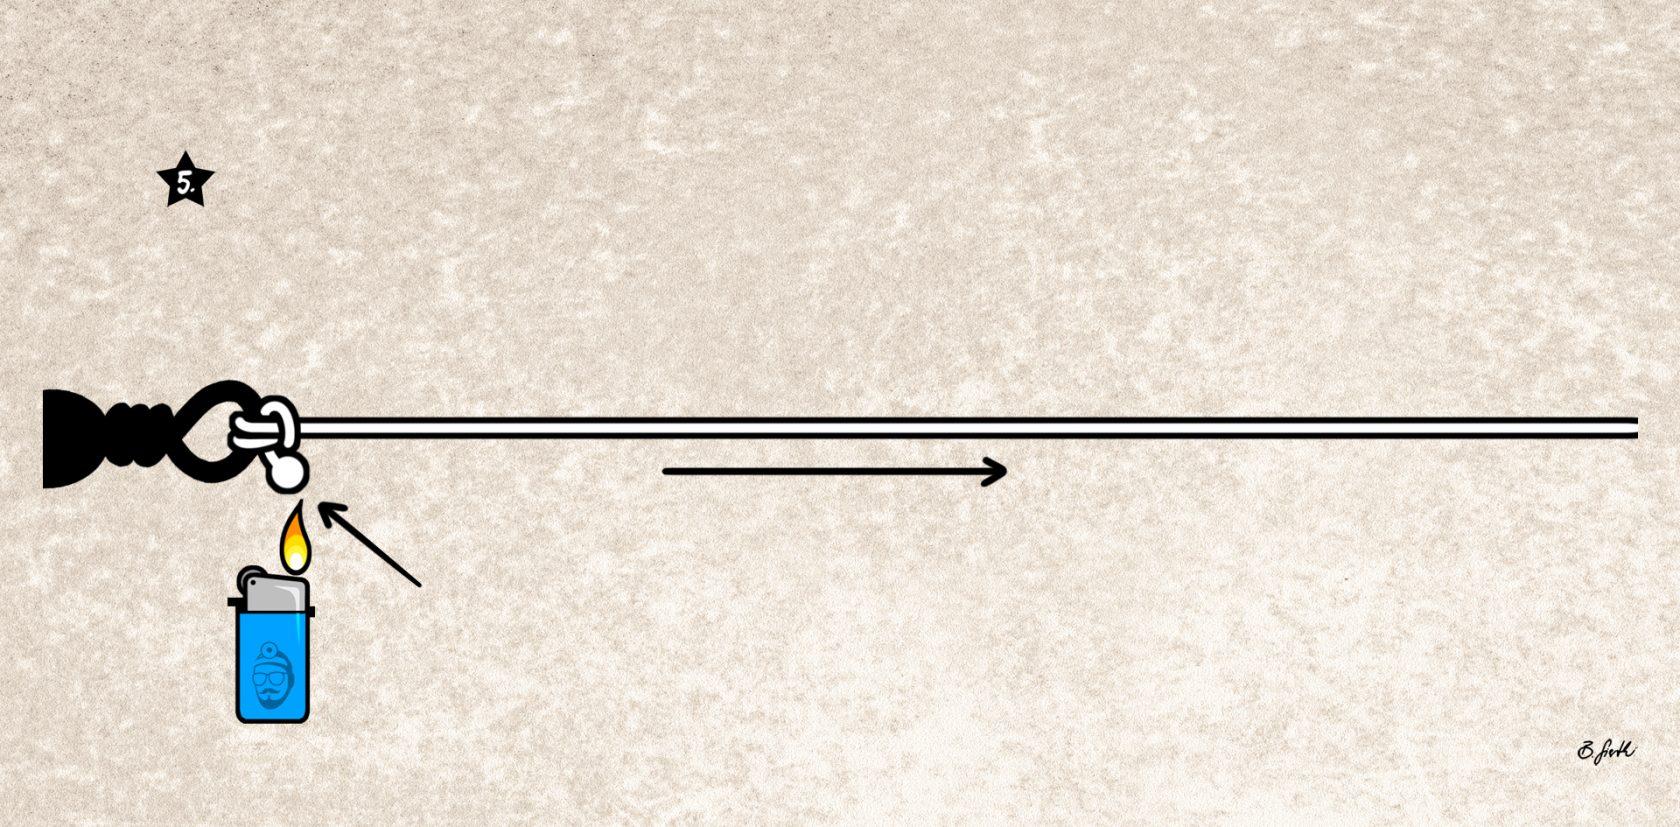 Fat Mono Knoten für dicke monofile Schnur